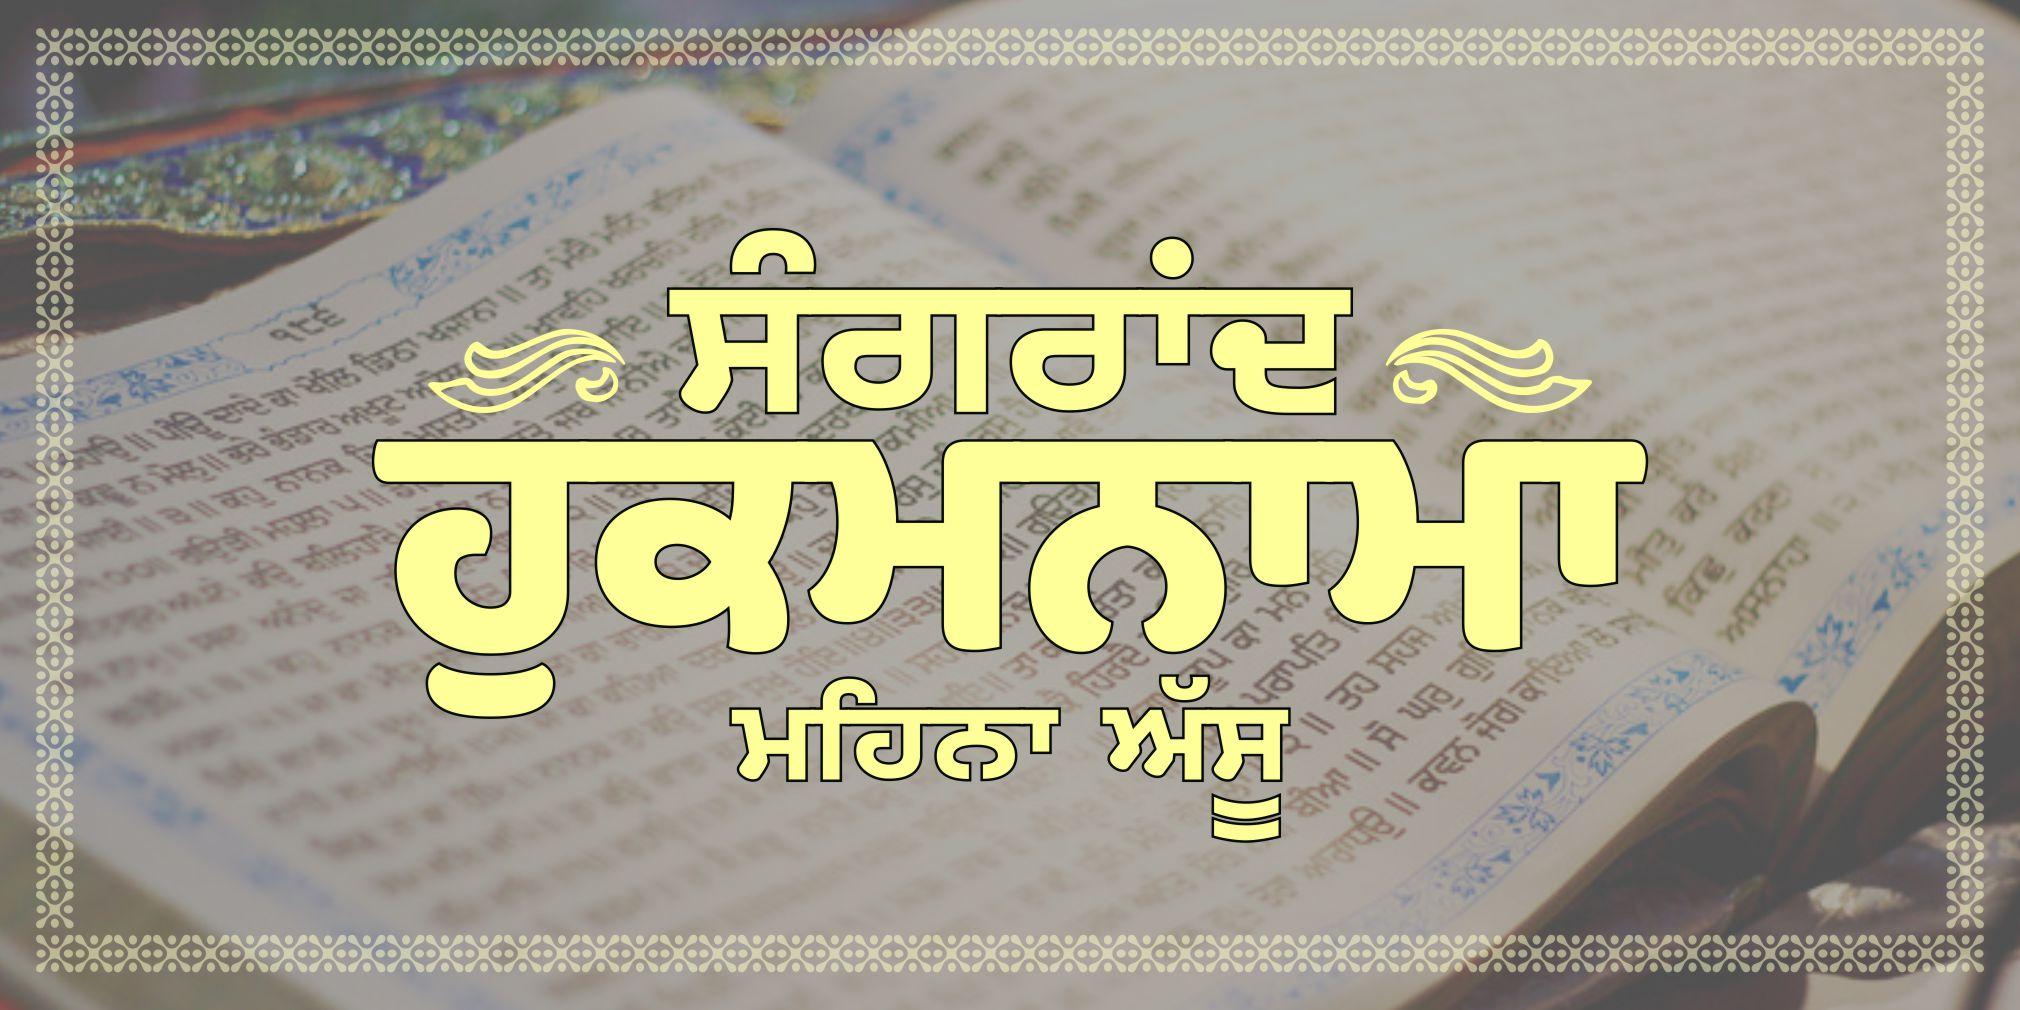 Sangrand Hukamnama Greetings Mahina Assu - Dhansikhi